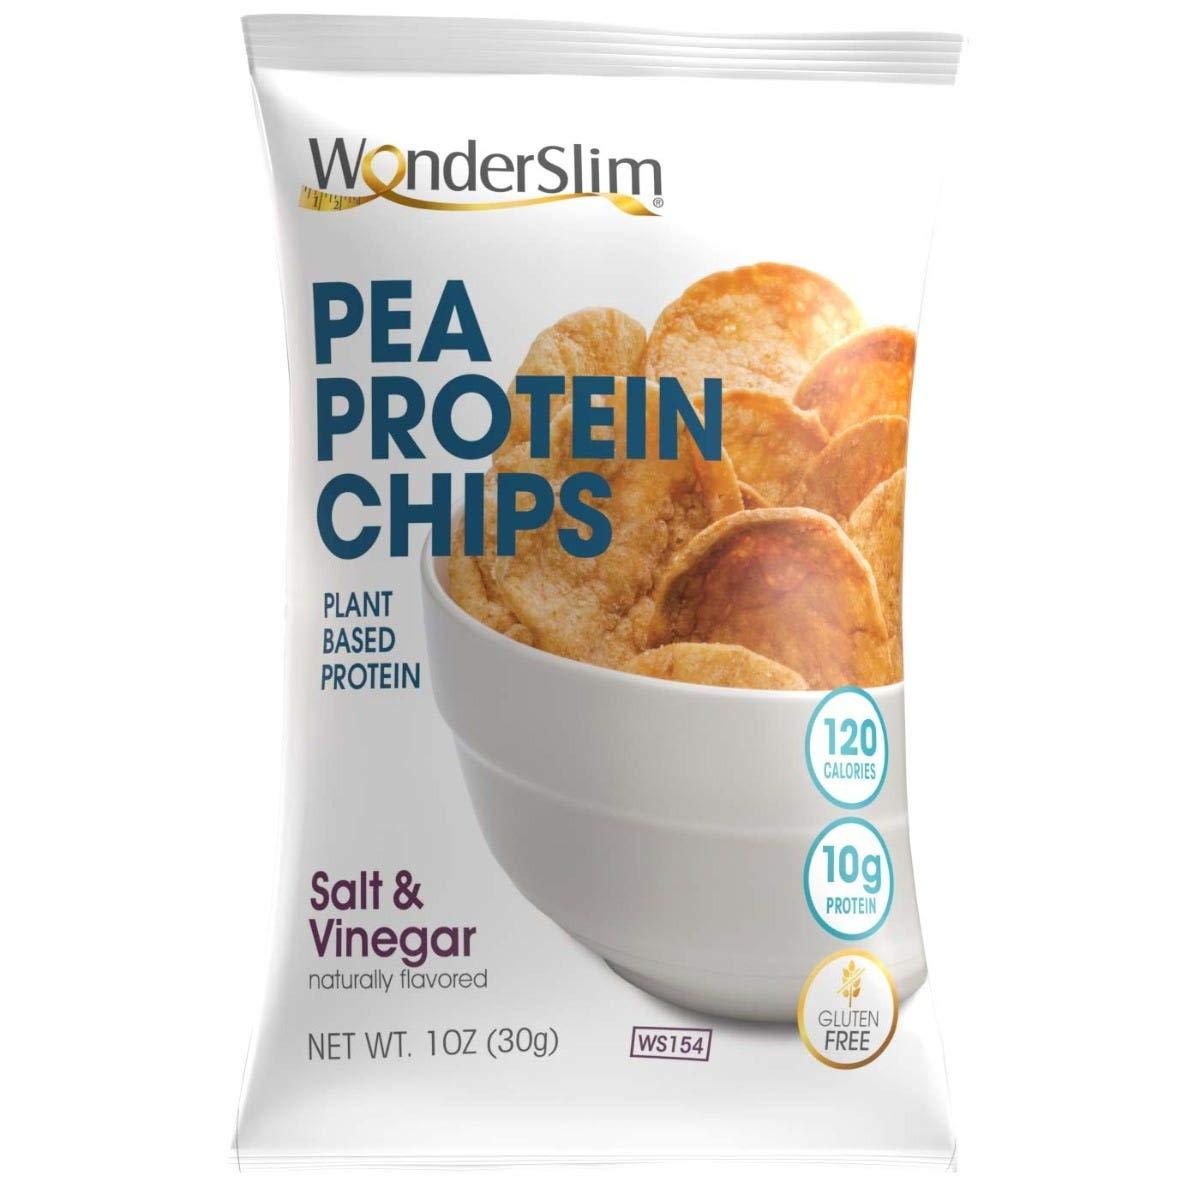 WonderSlim Pea Protein Snack Chips (12g Protein) - Salt & Vinegar - Low-Carb Diet Healthy Protein Snack - Gluten-Free, Vegan (10 Bags)